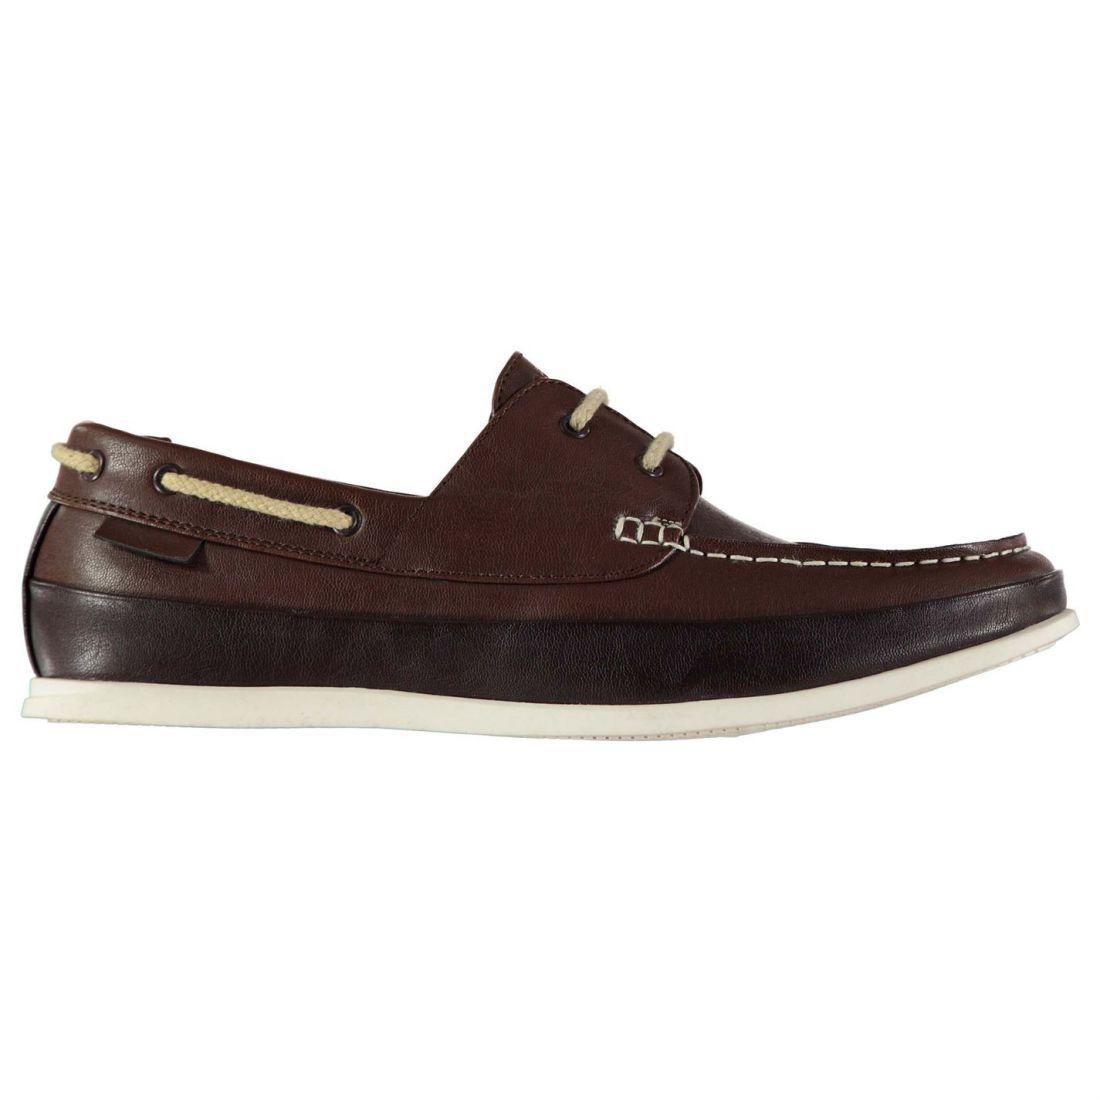 cf9d6e033 Soviet Mens Classic Boat Shoes Lace Up Moccasin Toe Contrast Colour ...